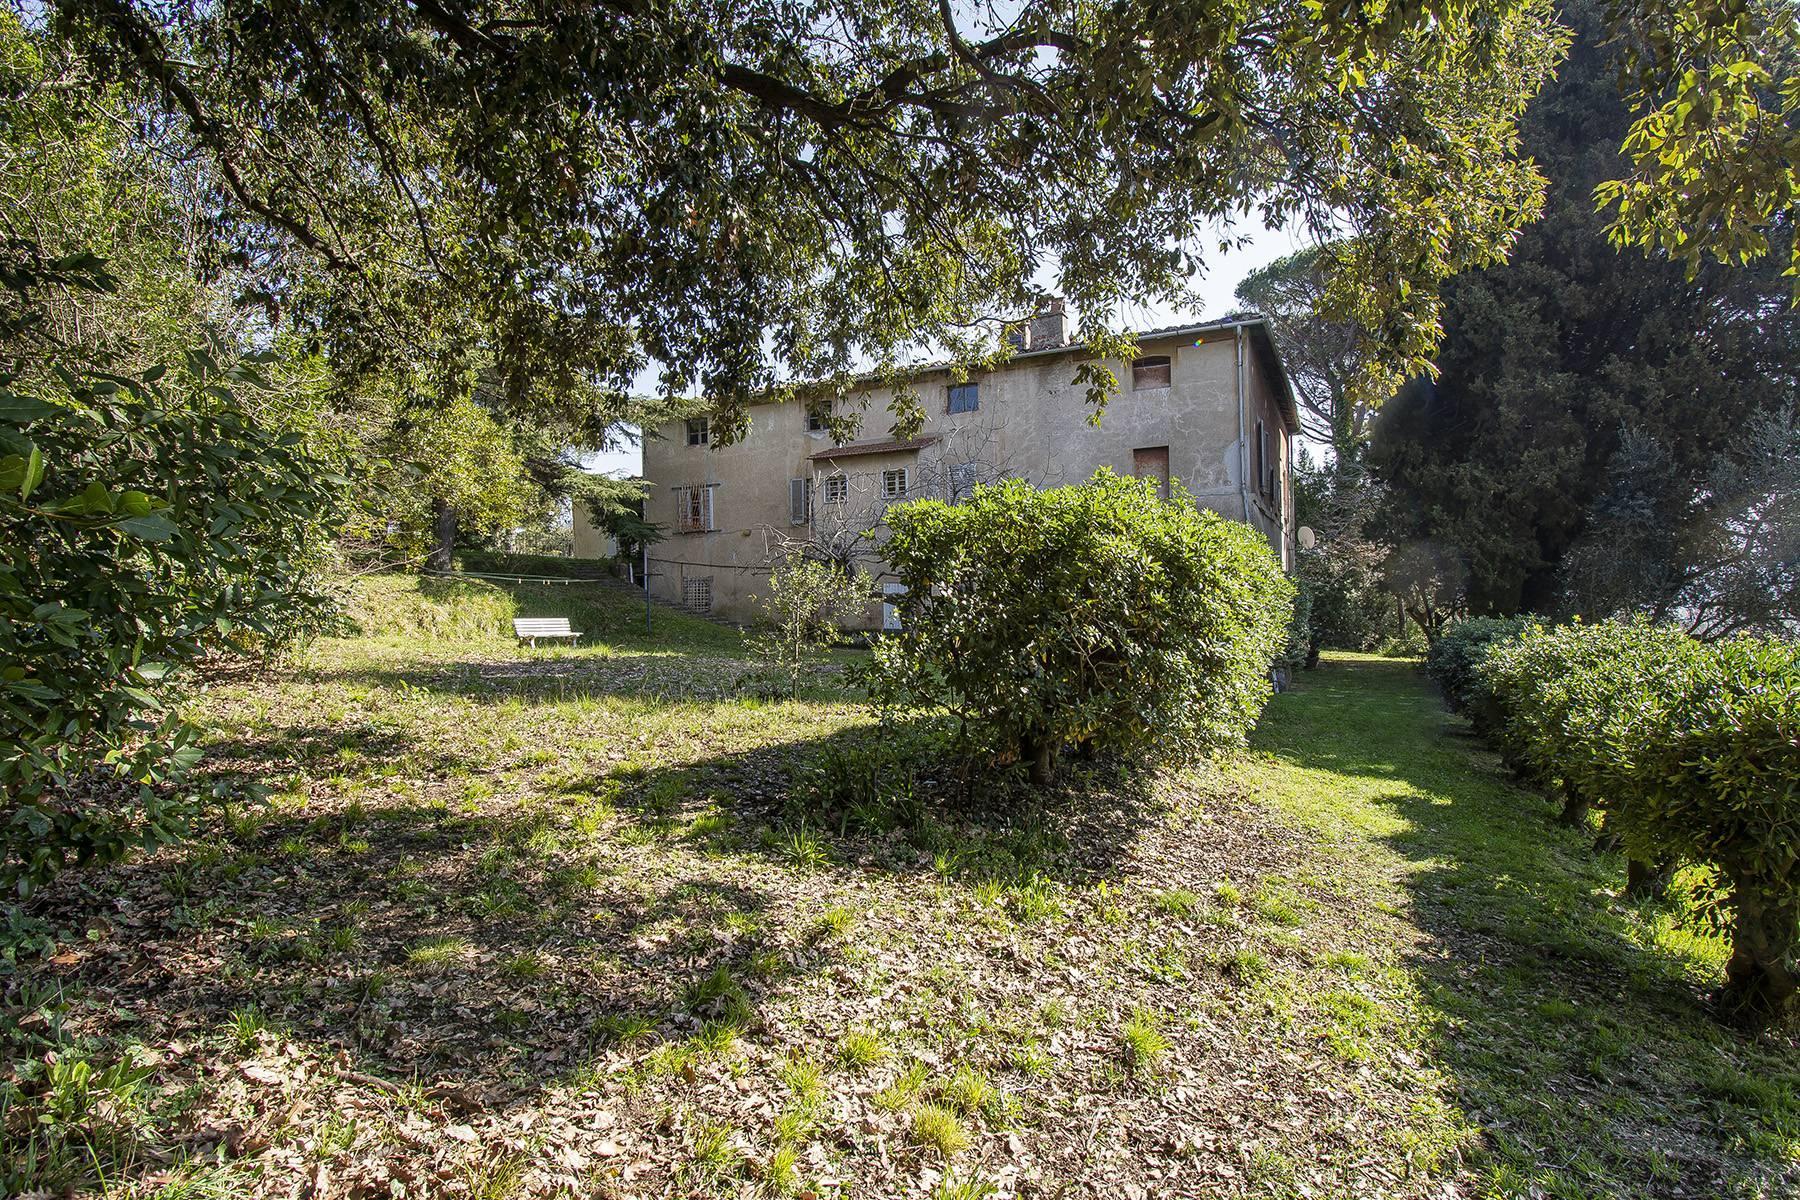 Romantic villa on the hills between Pisa and Lucca - 28